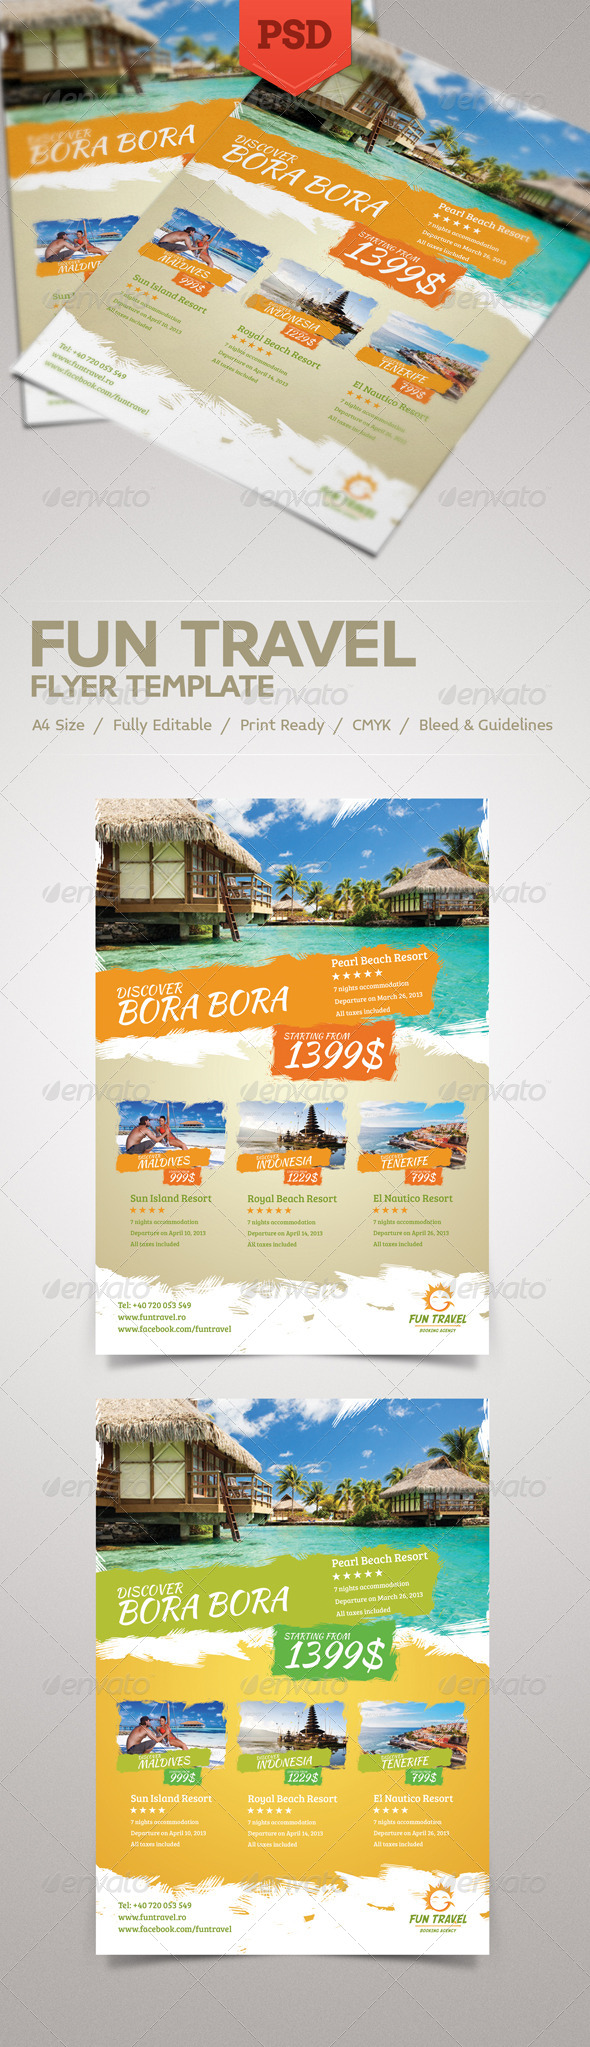 Fun Travel Flyer - Commerce Flyers